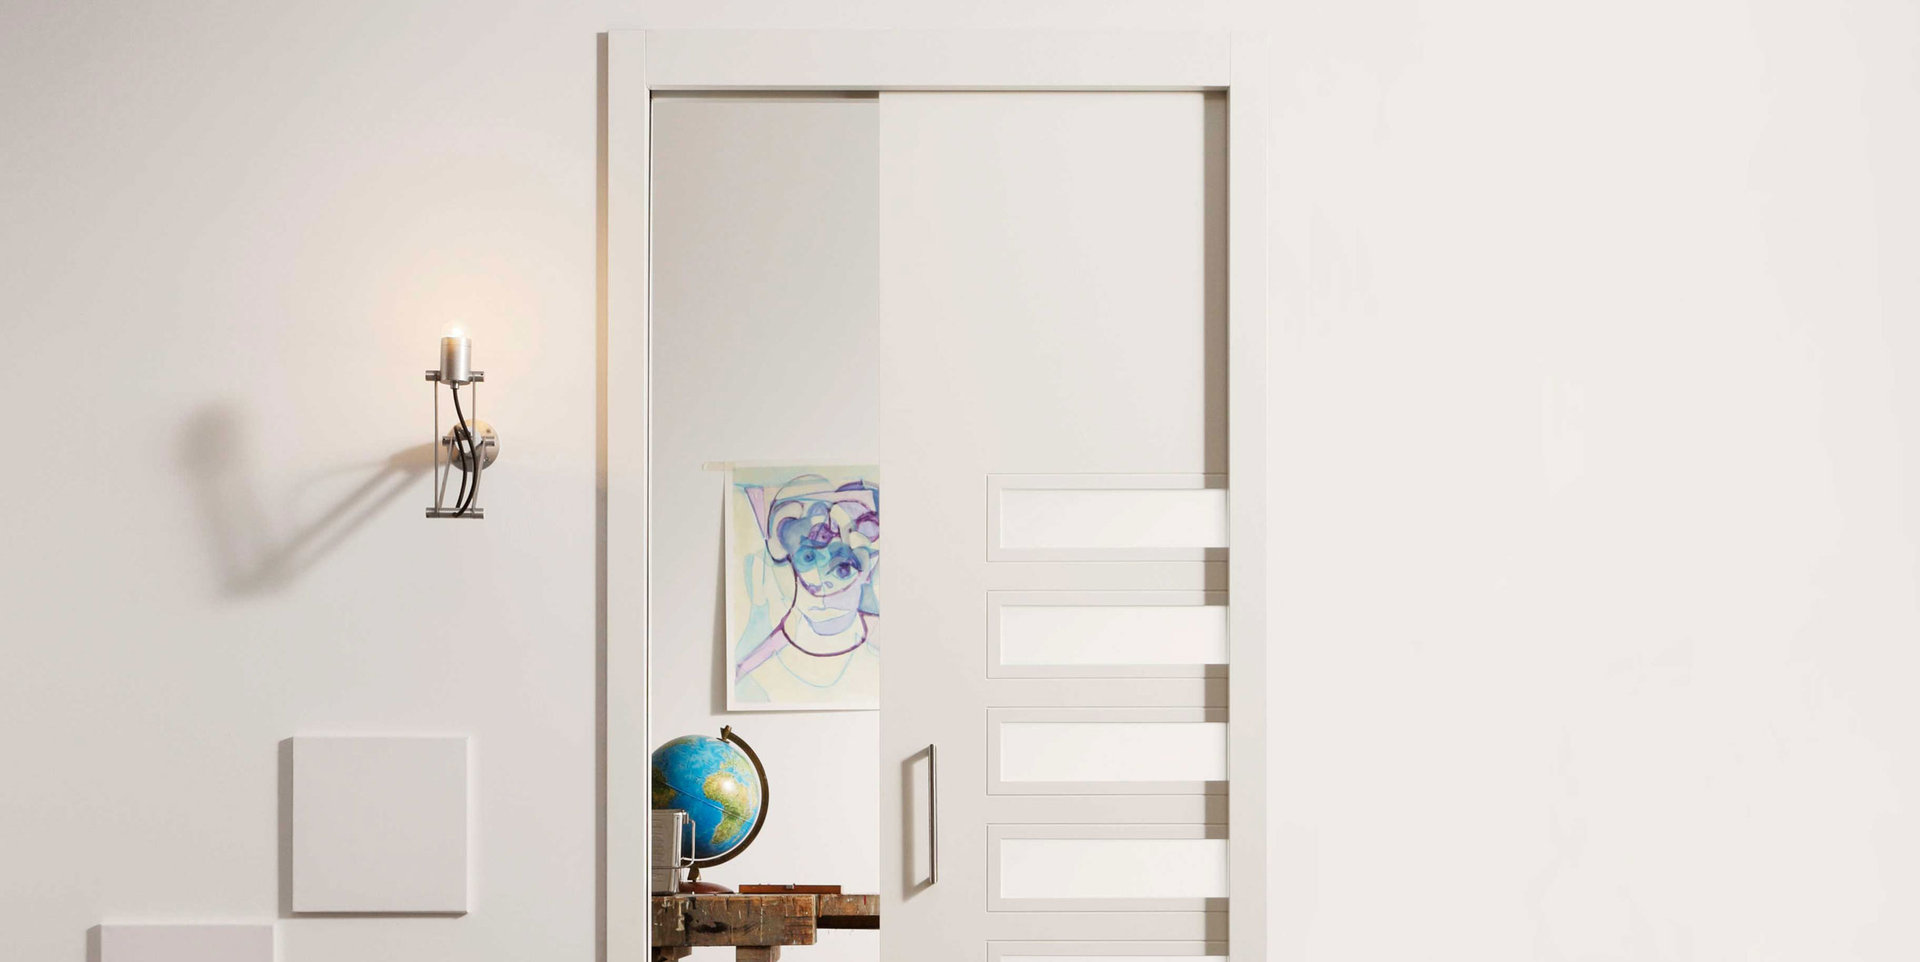 syst me de portes coulissantes galandage svedex. Black Bedroom Furniture Sets. Home Design Ideas